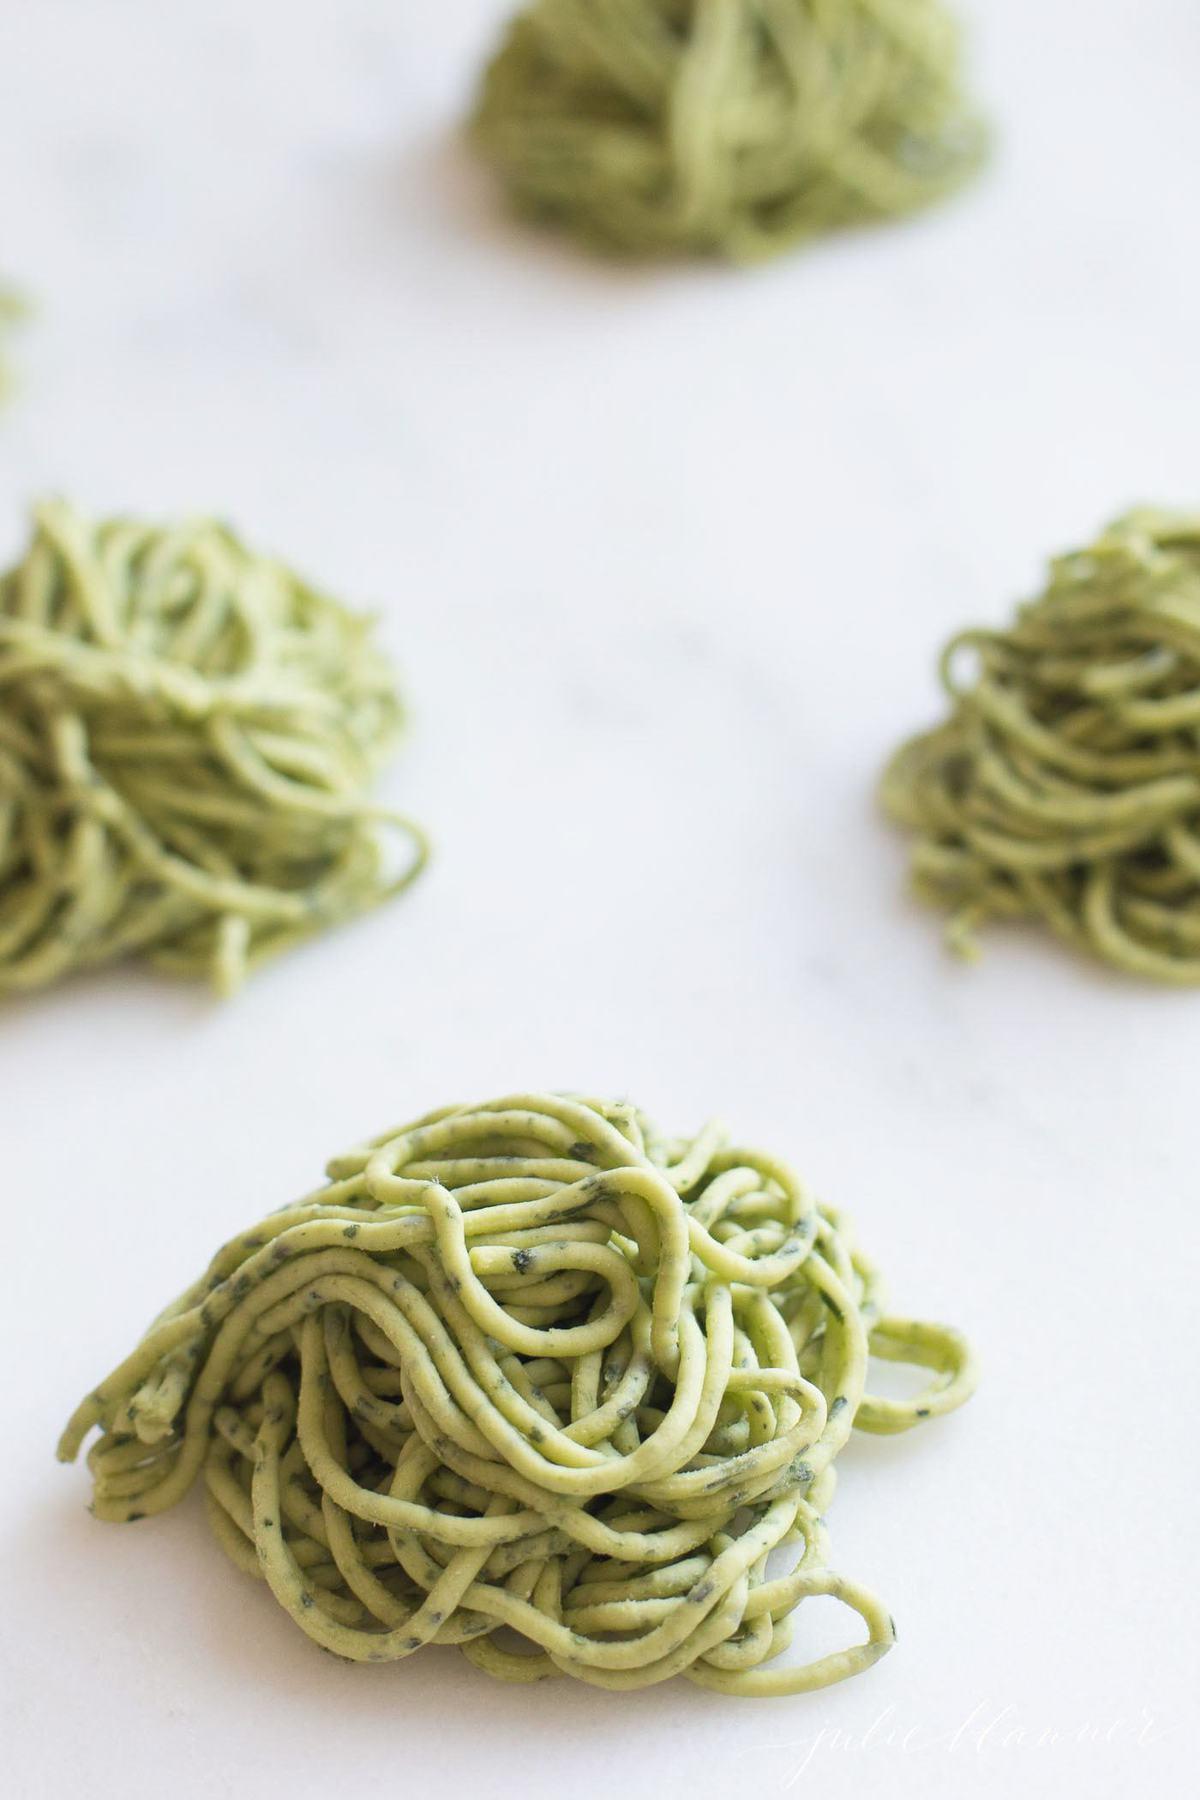 Uncooked arugula pasta in small piles